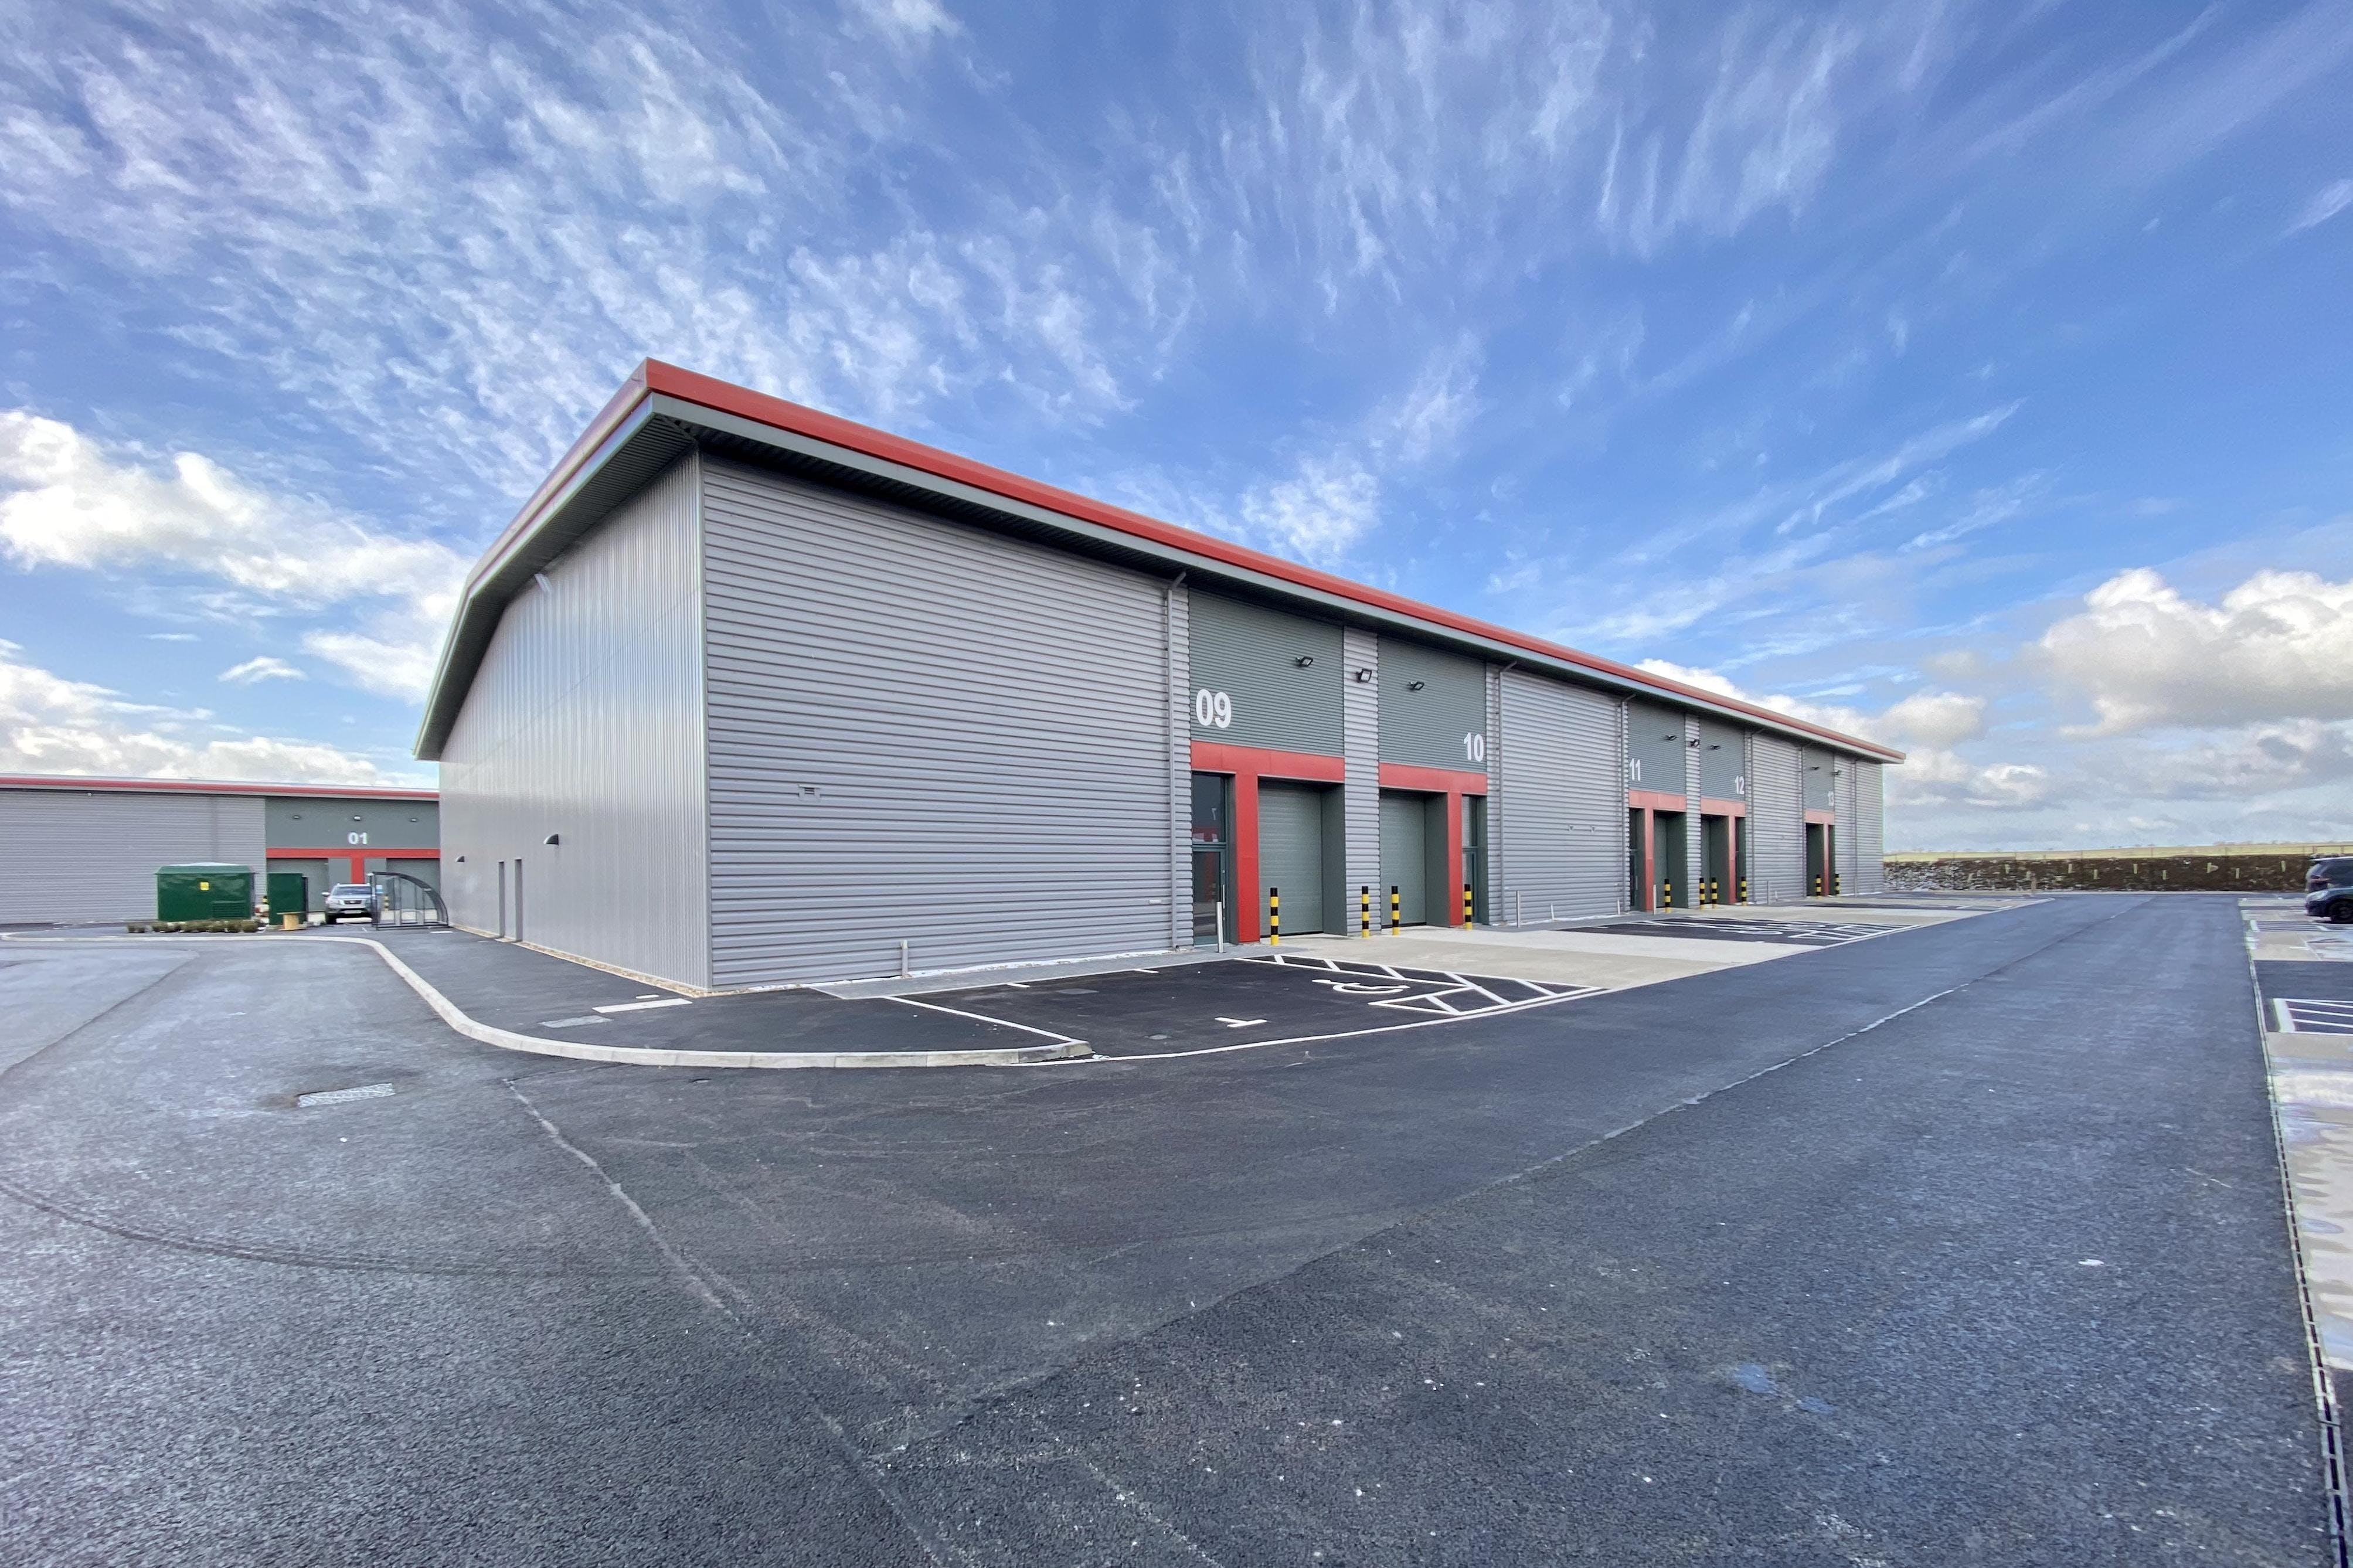 Tavis House Business Centre, Haddenham, Industrial / Investment To Let / For Sale - UNITS 9-13.JPG